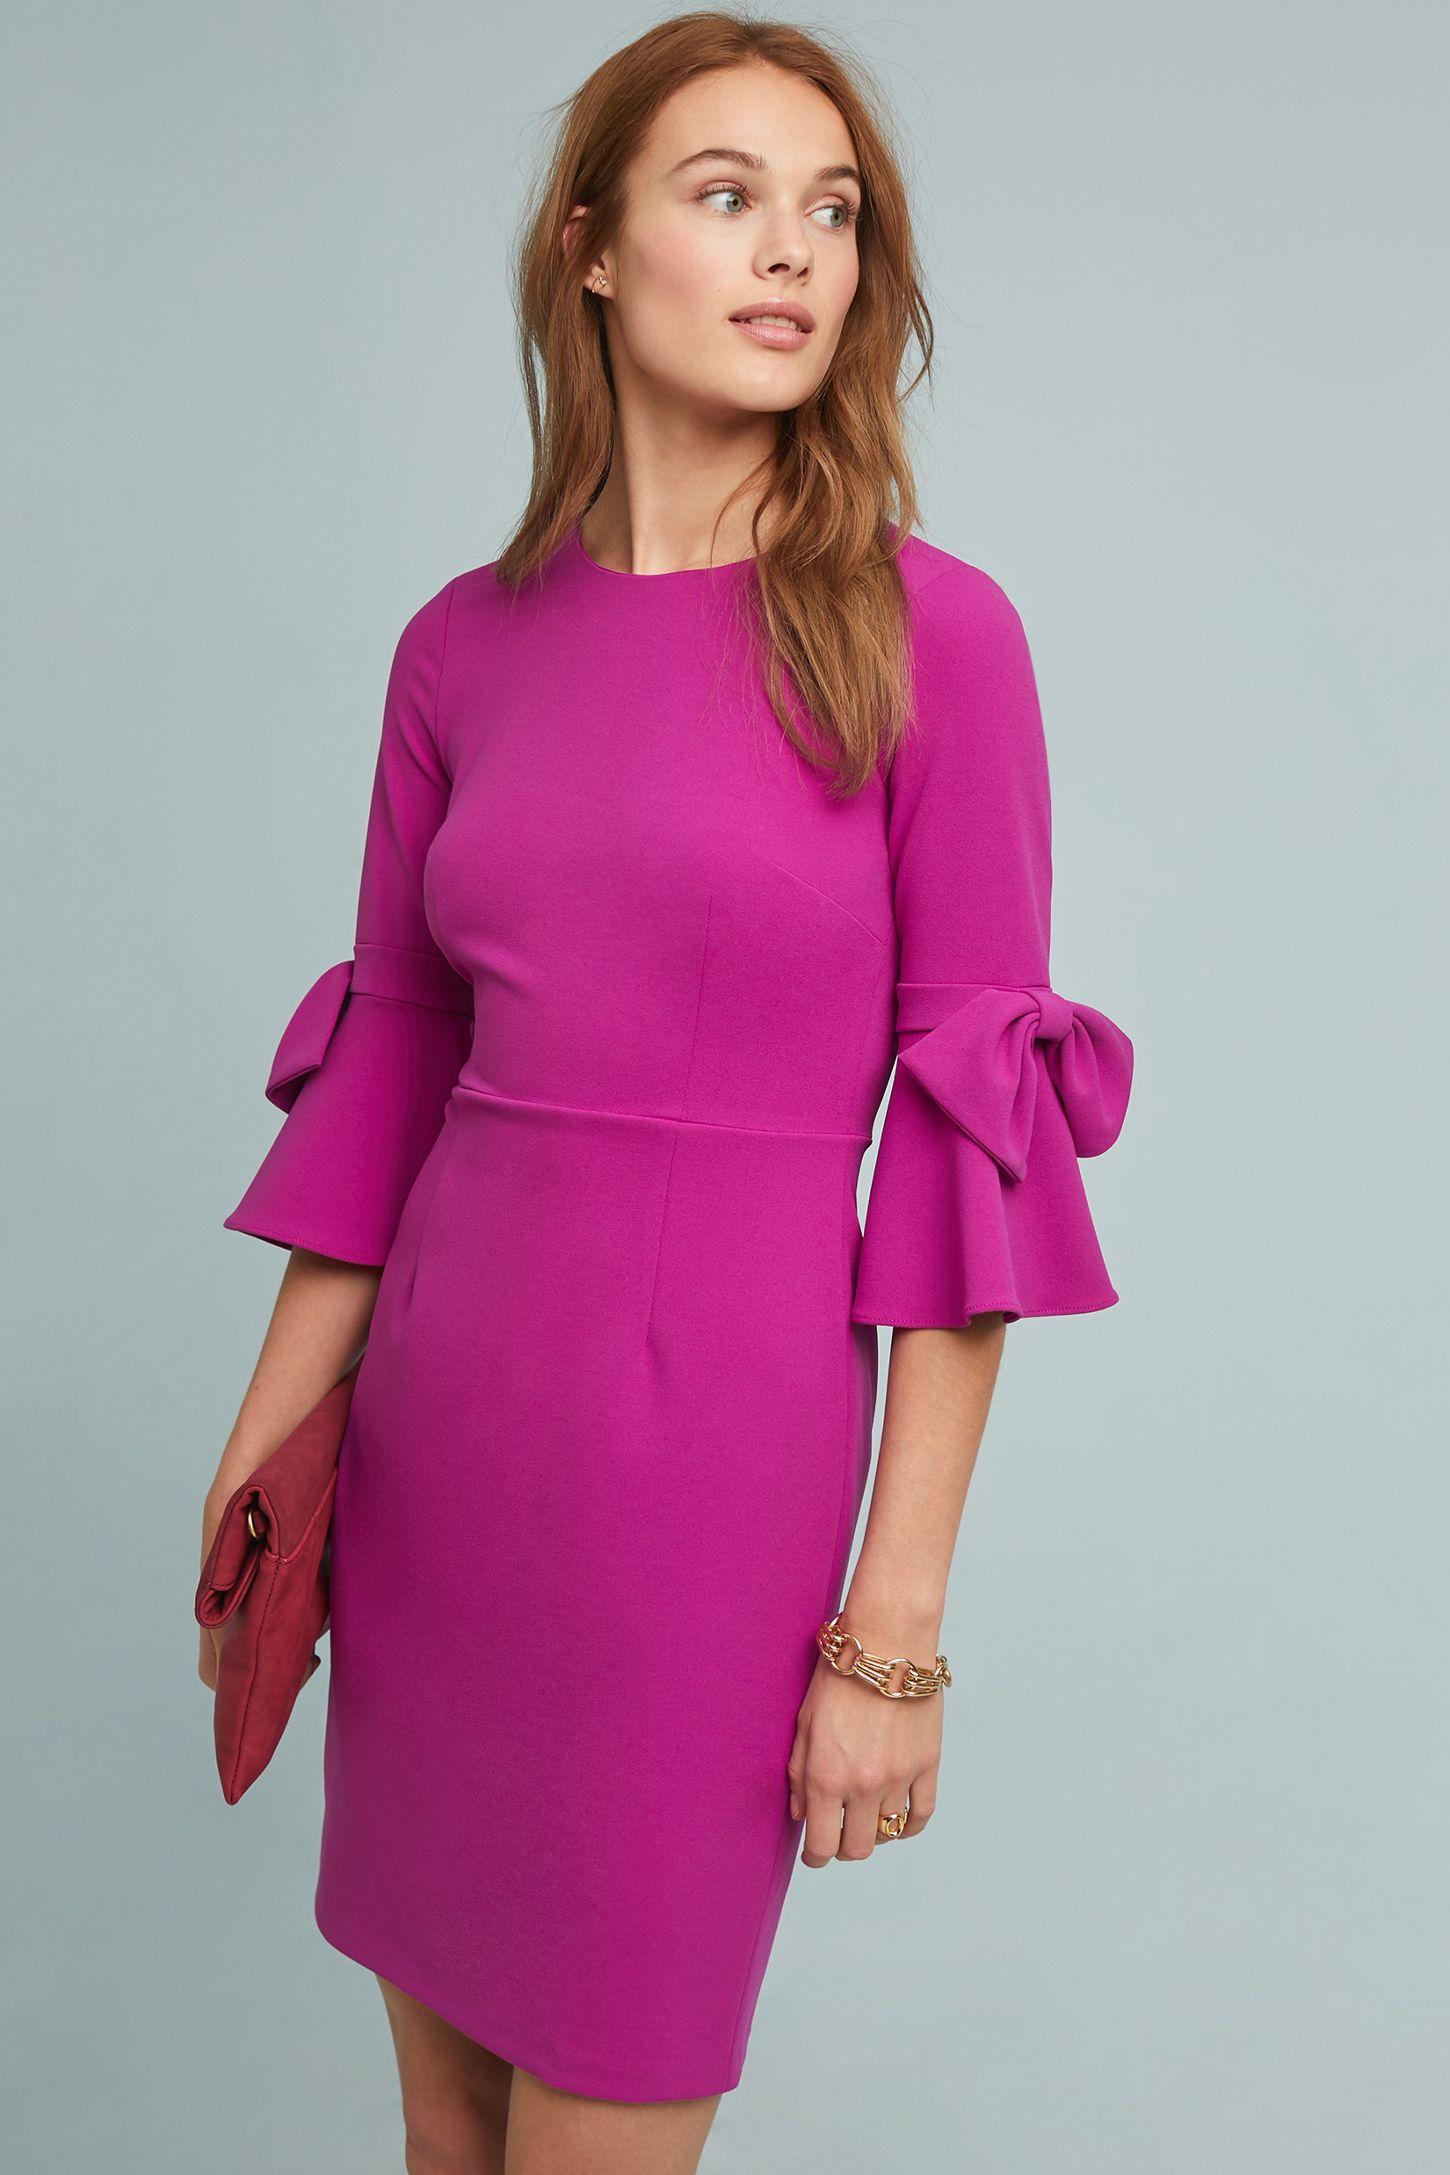 651c7b33317ce3 Kaia Sheath Dress